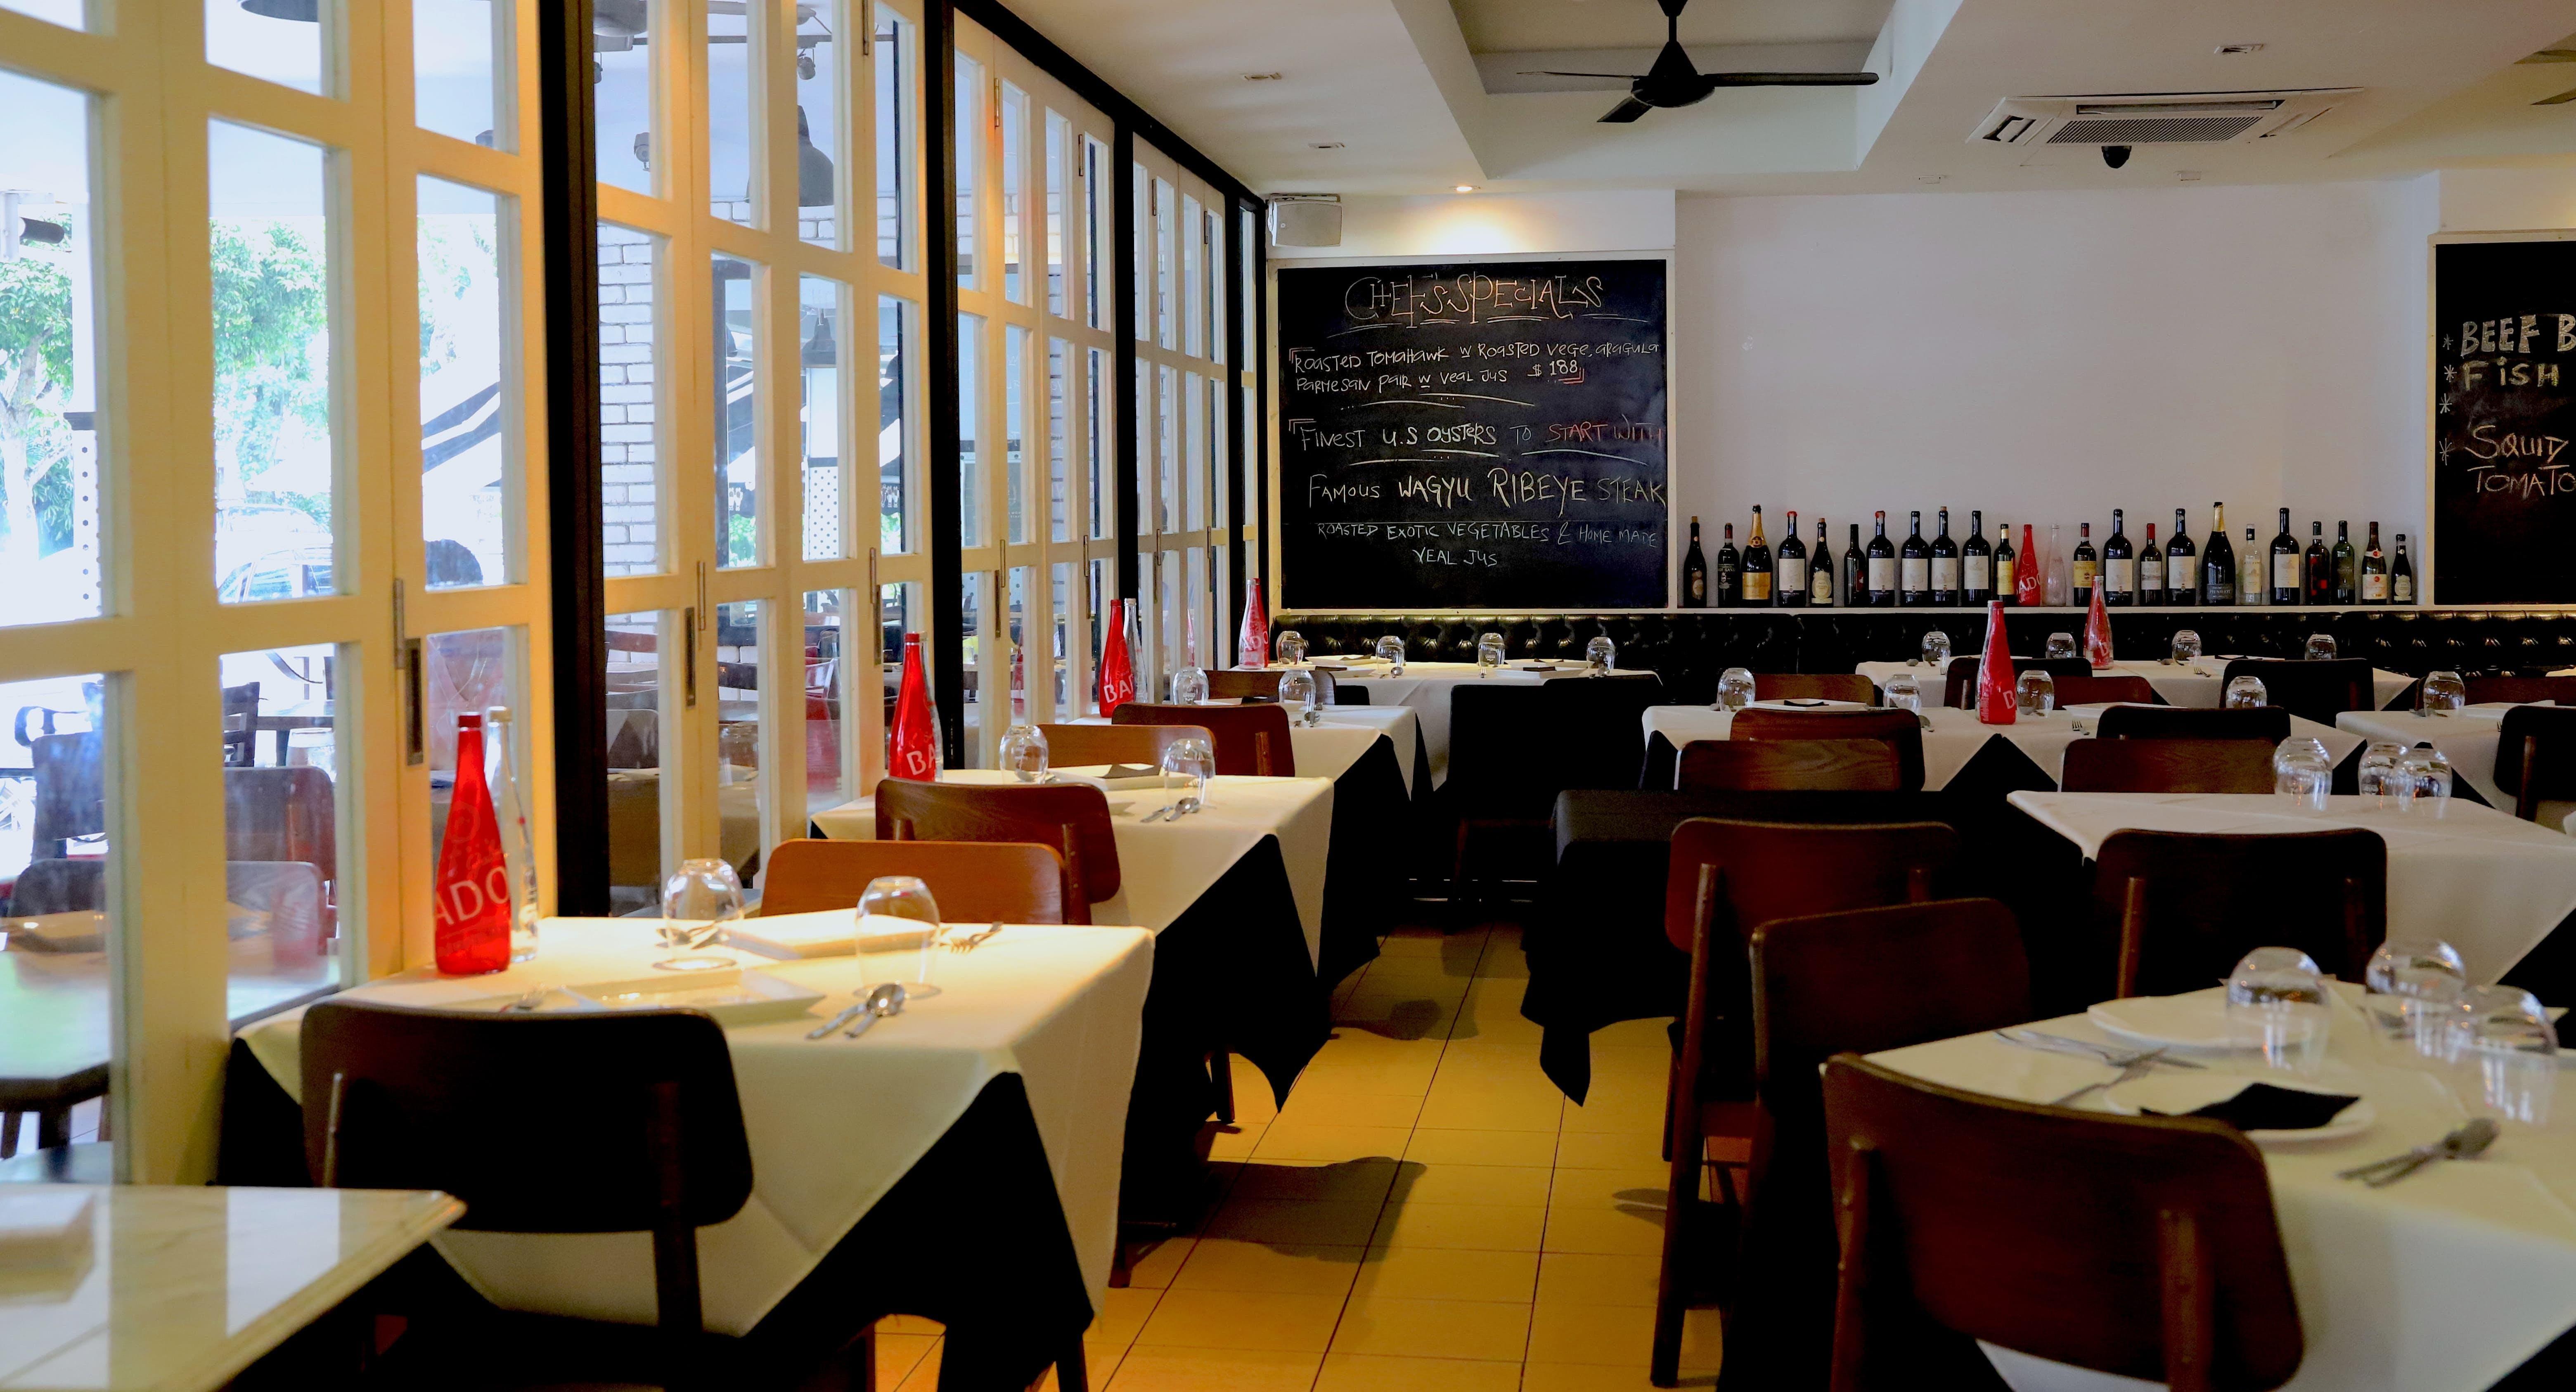 RUBATO Italian Kitchen & Bar Singapore image 2